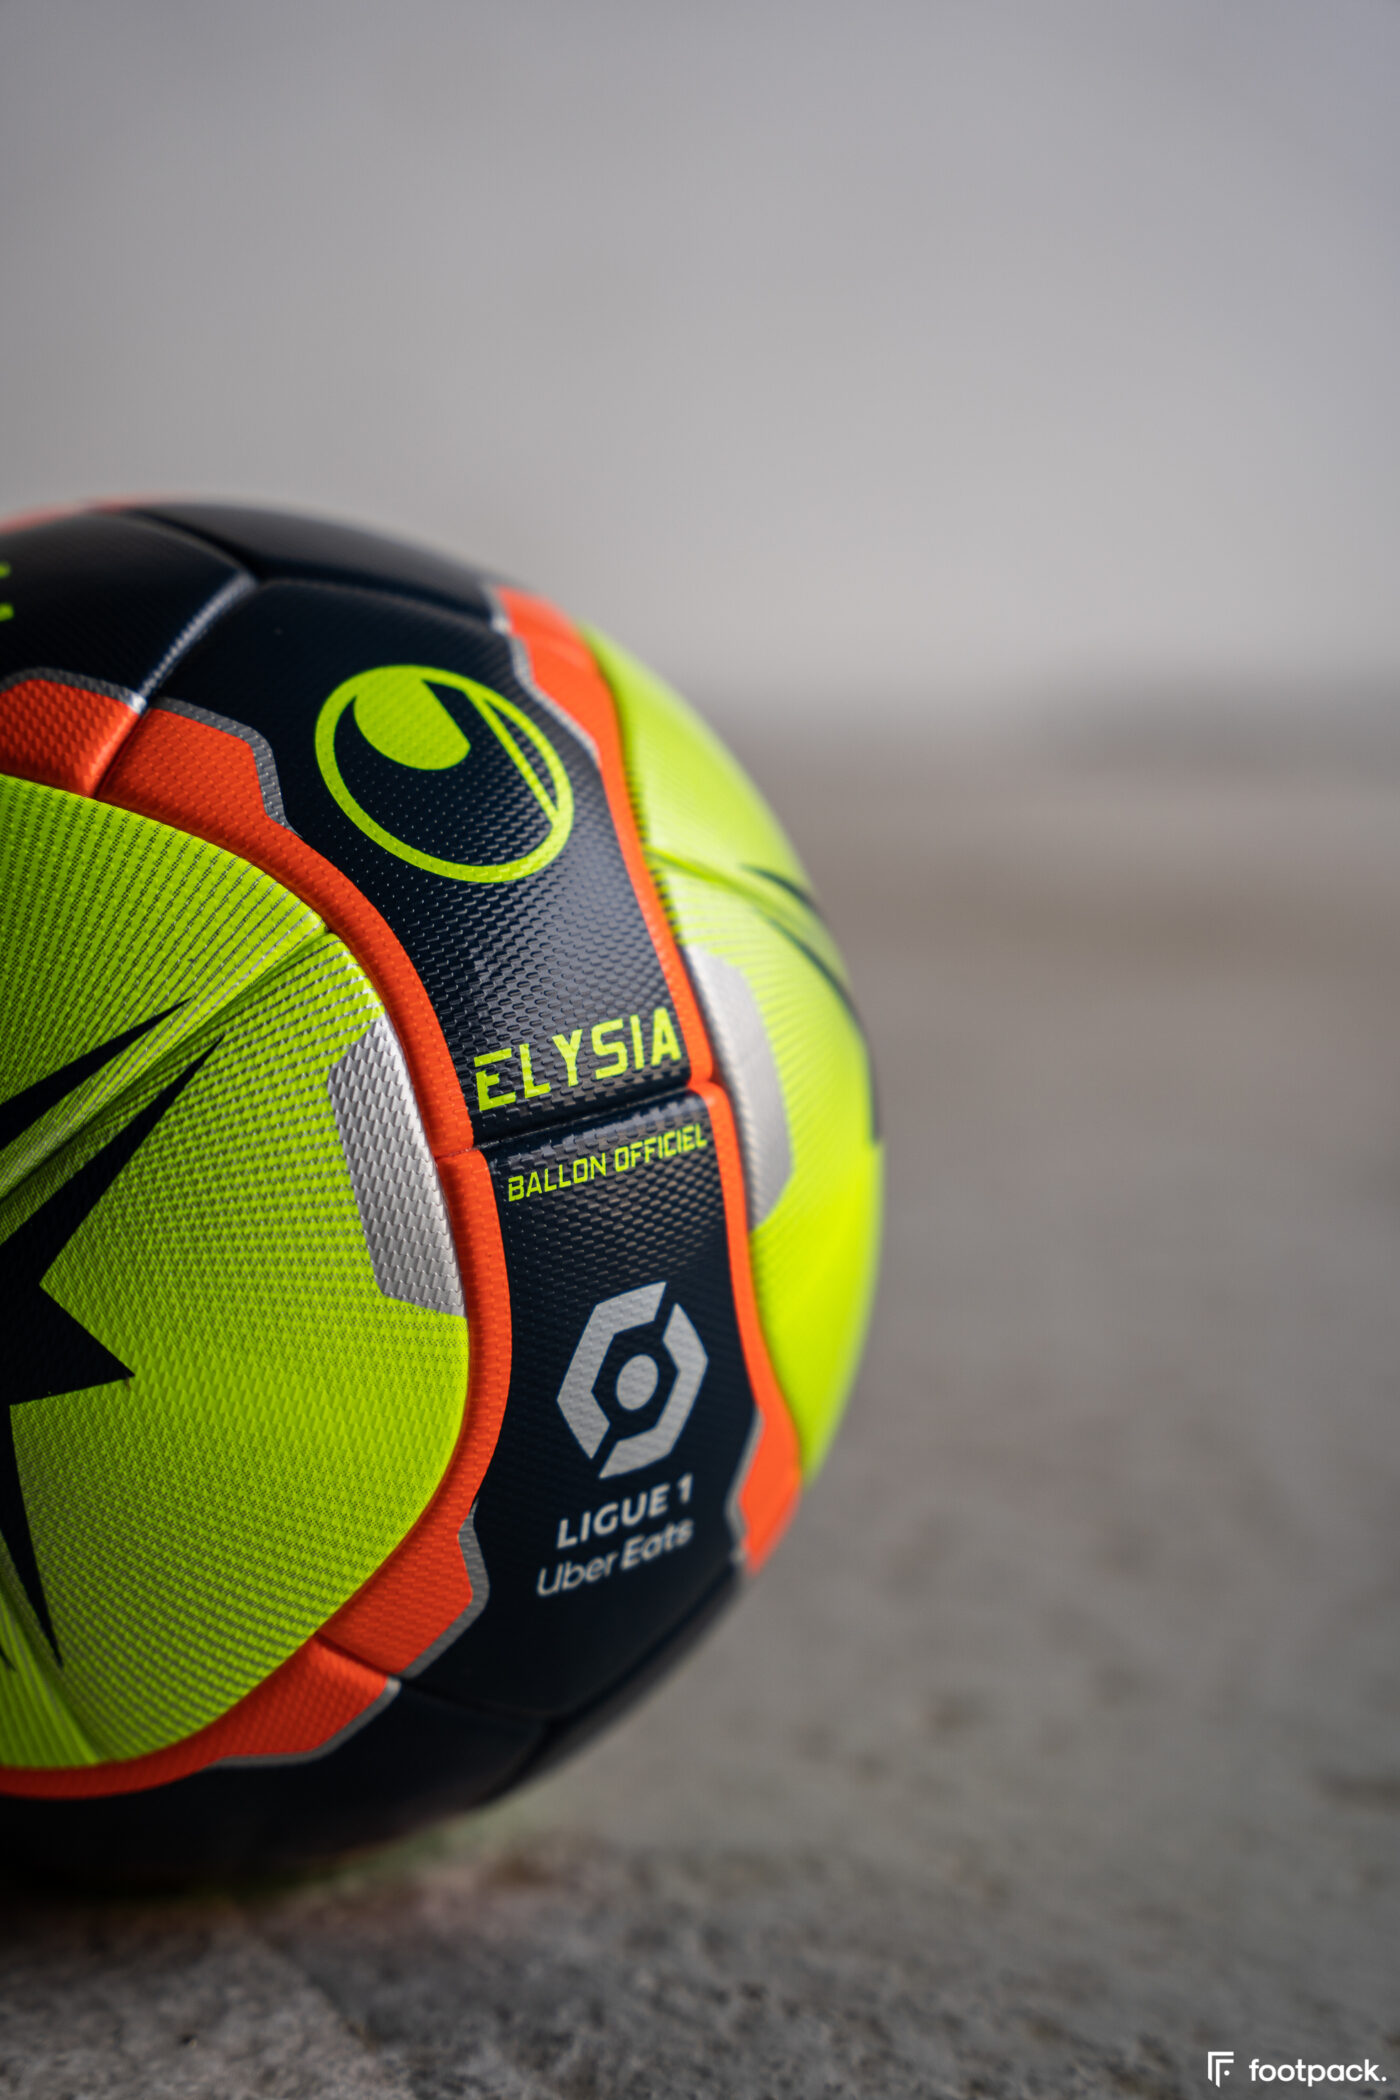 Ballon Ligue 1 2021-2022 uhlsport